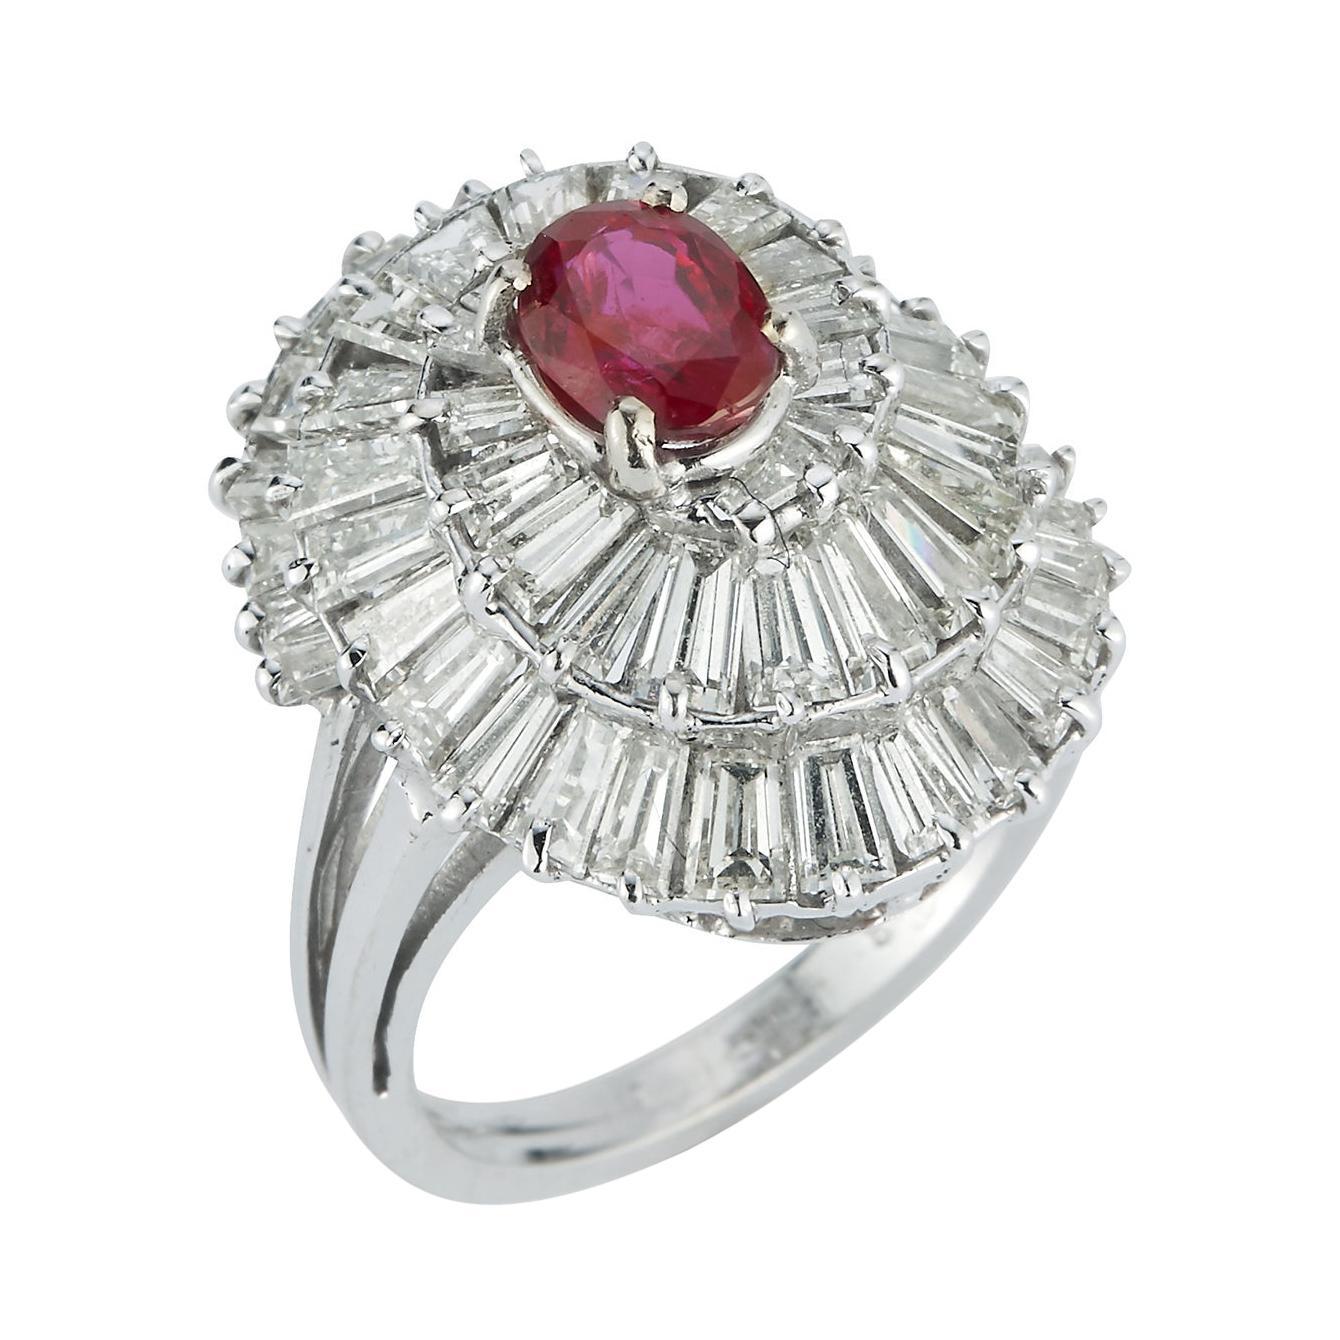 Ruby & Diamond Ballerina Cocktail Ring